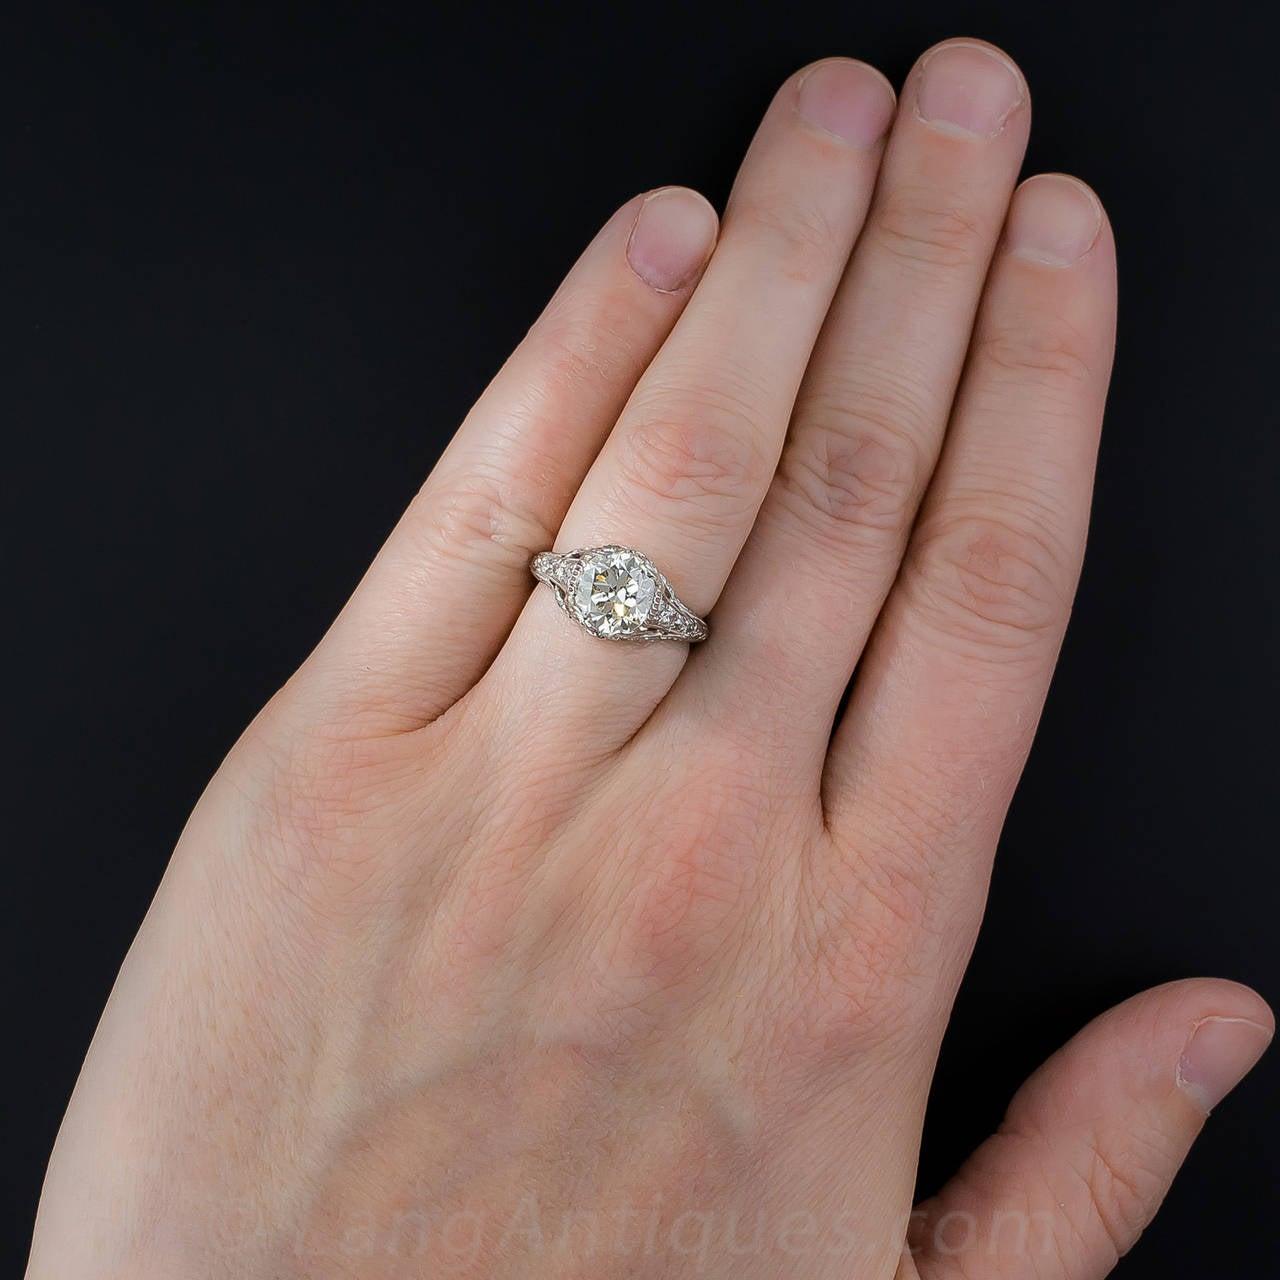 Edwardian GIA Cert 2.09 Carat Diamond Platinum Ring For Sale 2